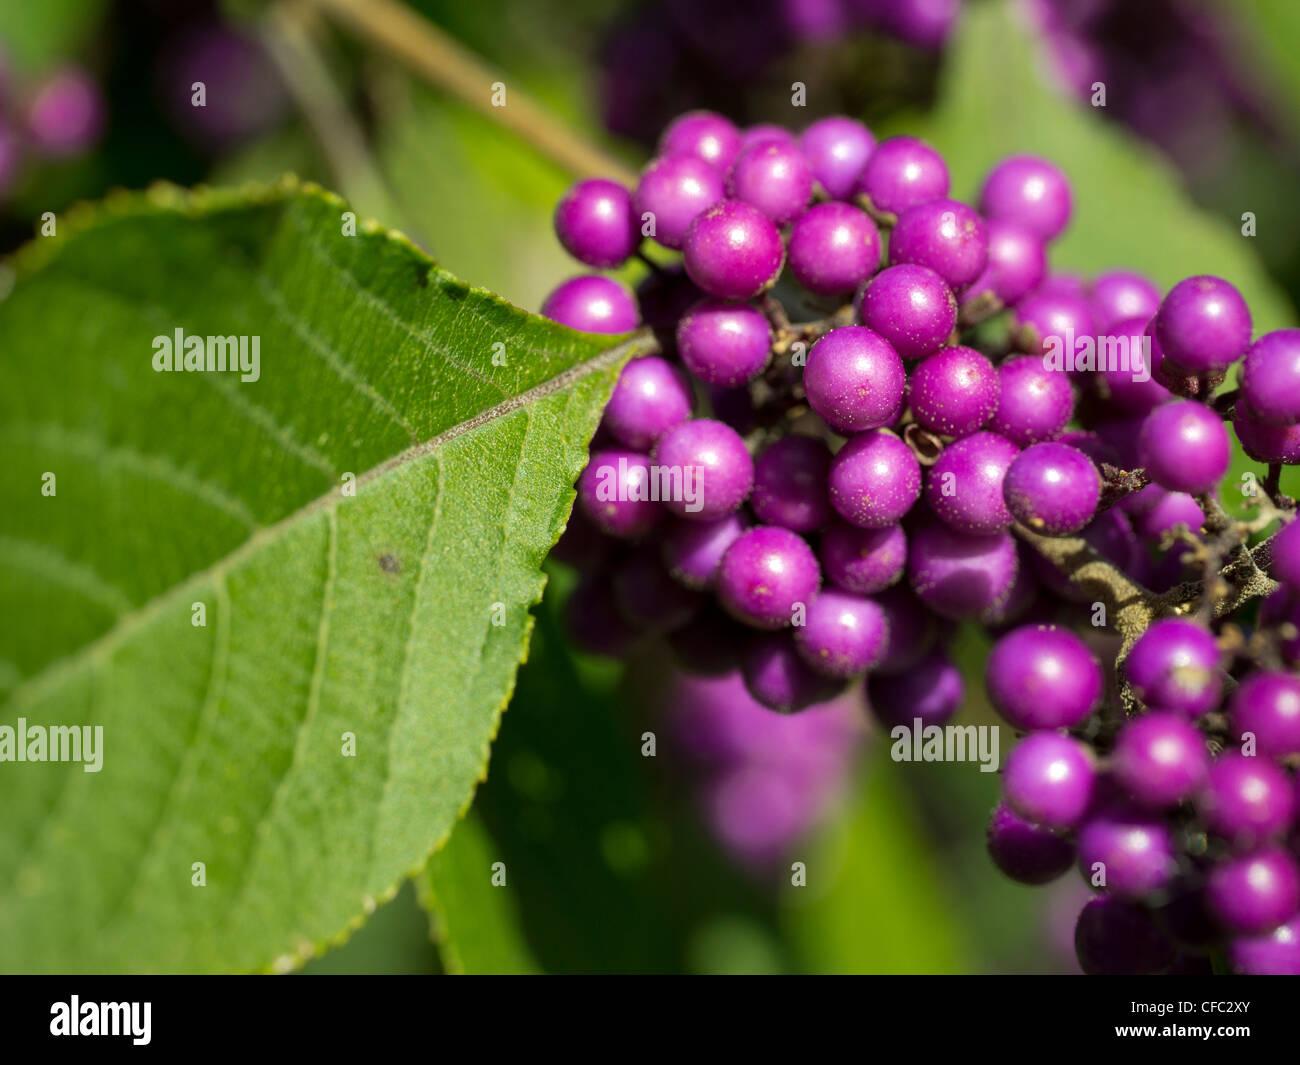 berry, Burgdorf, Callicarpa bodinieri, garden, shrub, ornamental shrub, bush, canton Bern, nature, plant, Switzerland, - Stock Image